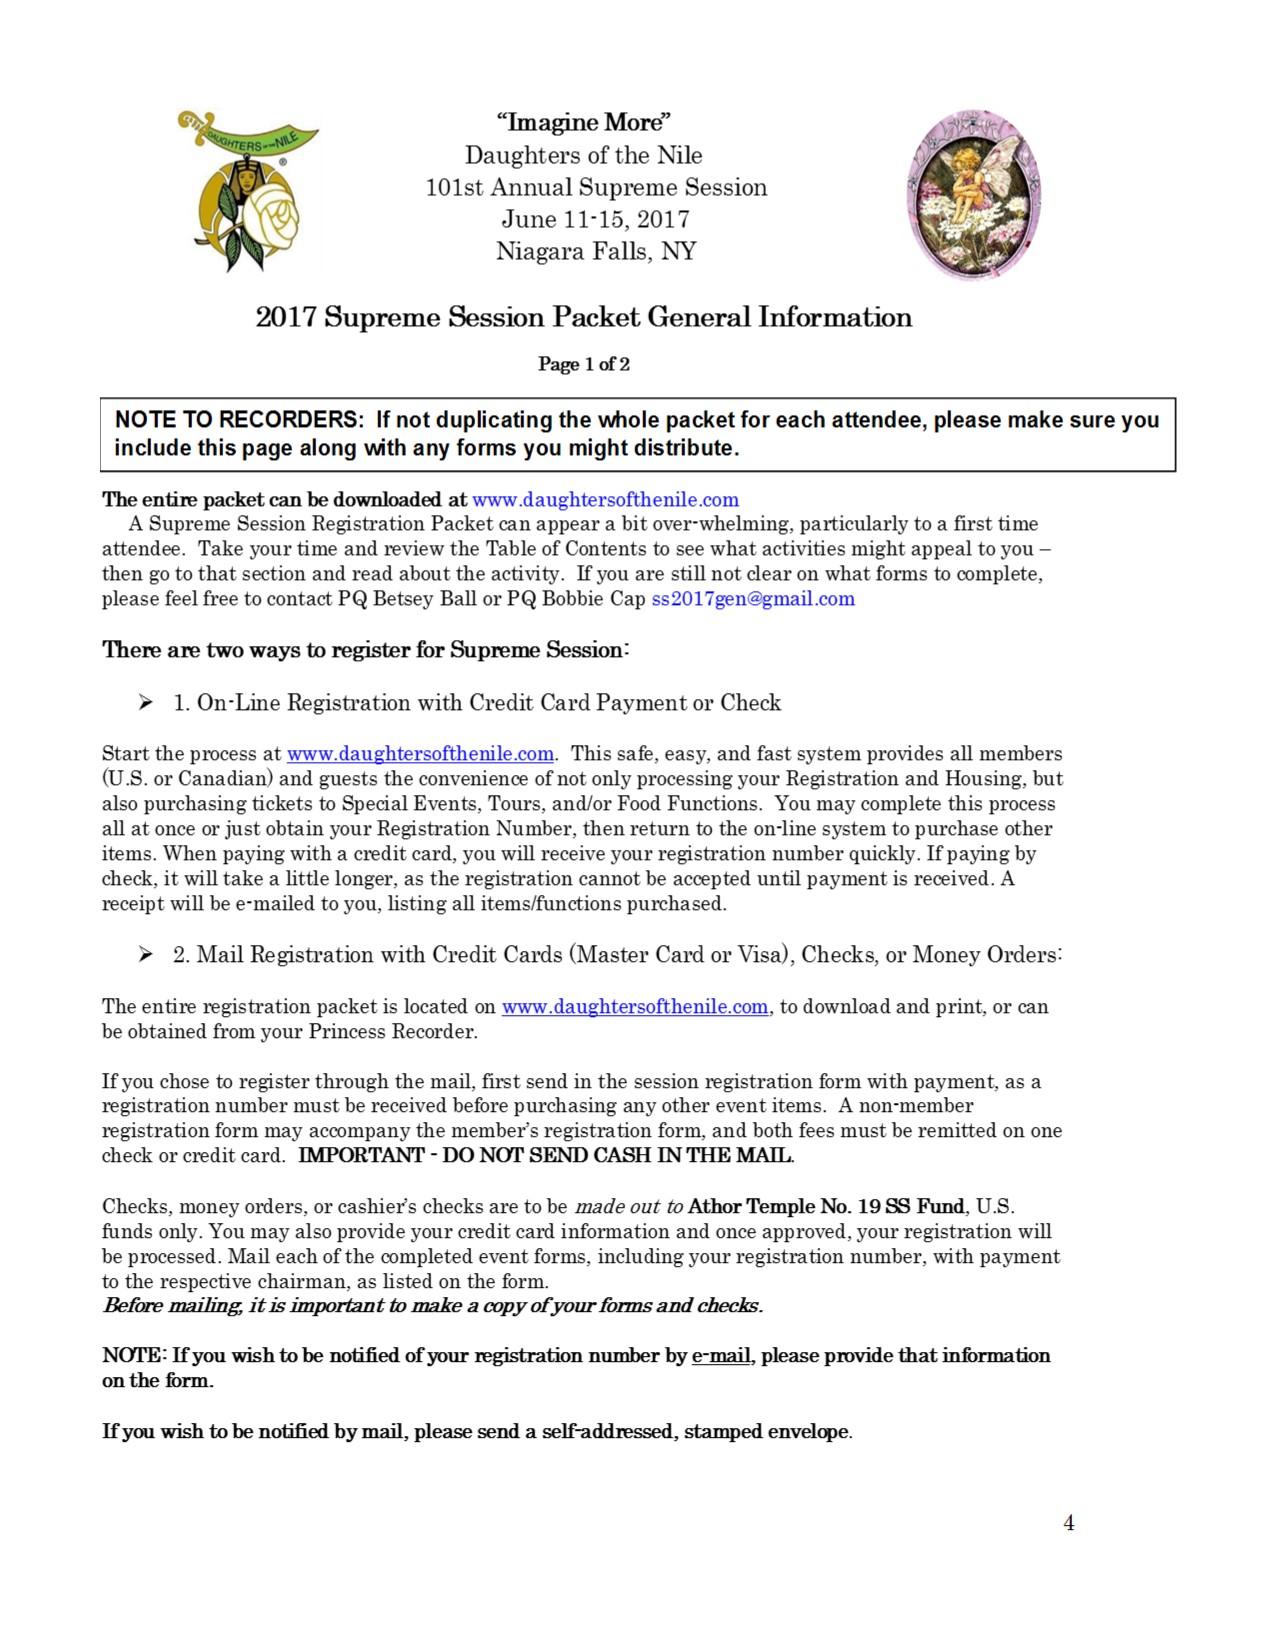 4 General Information